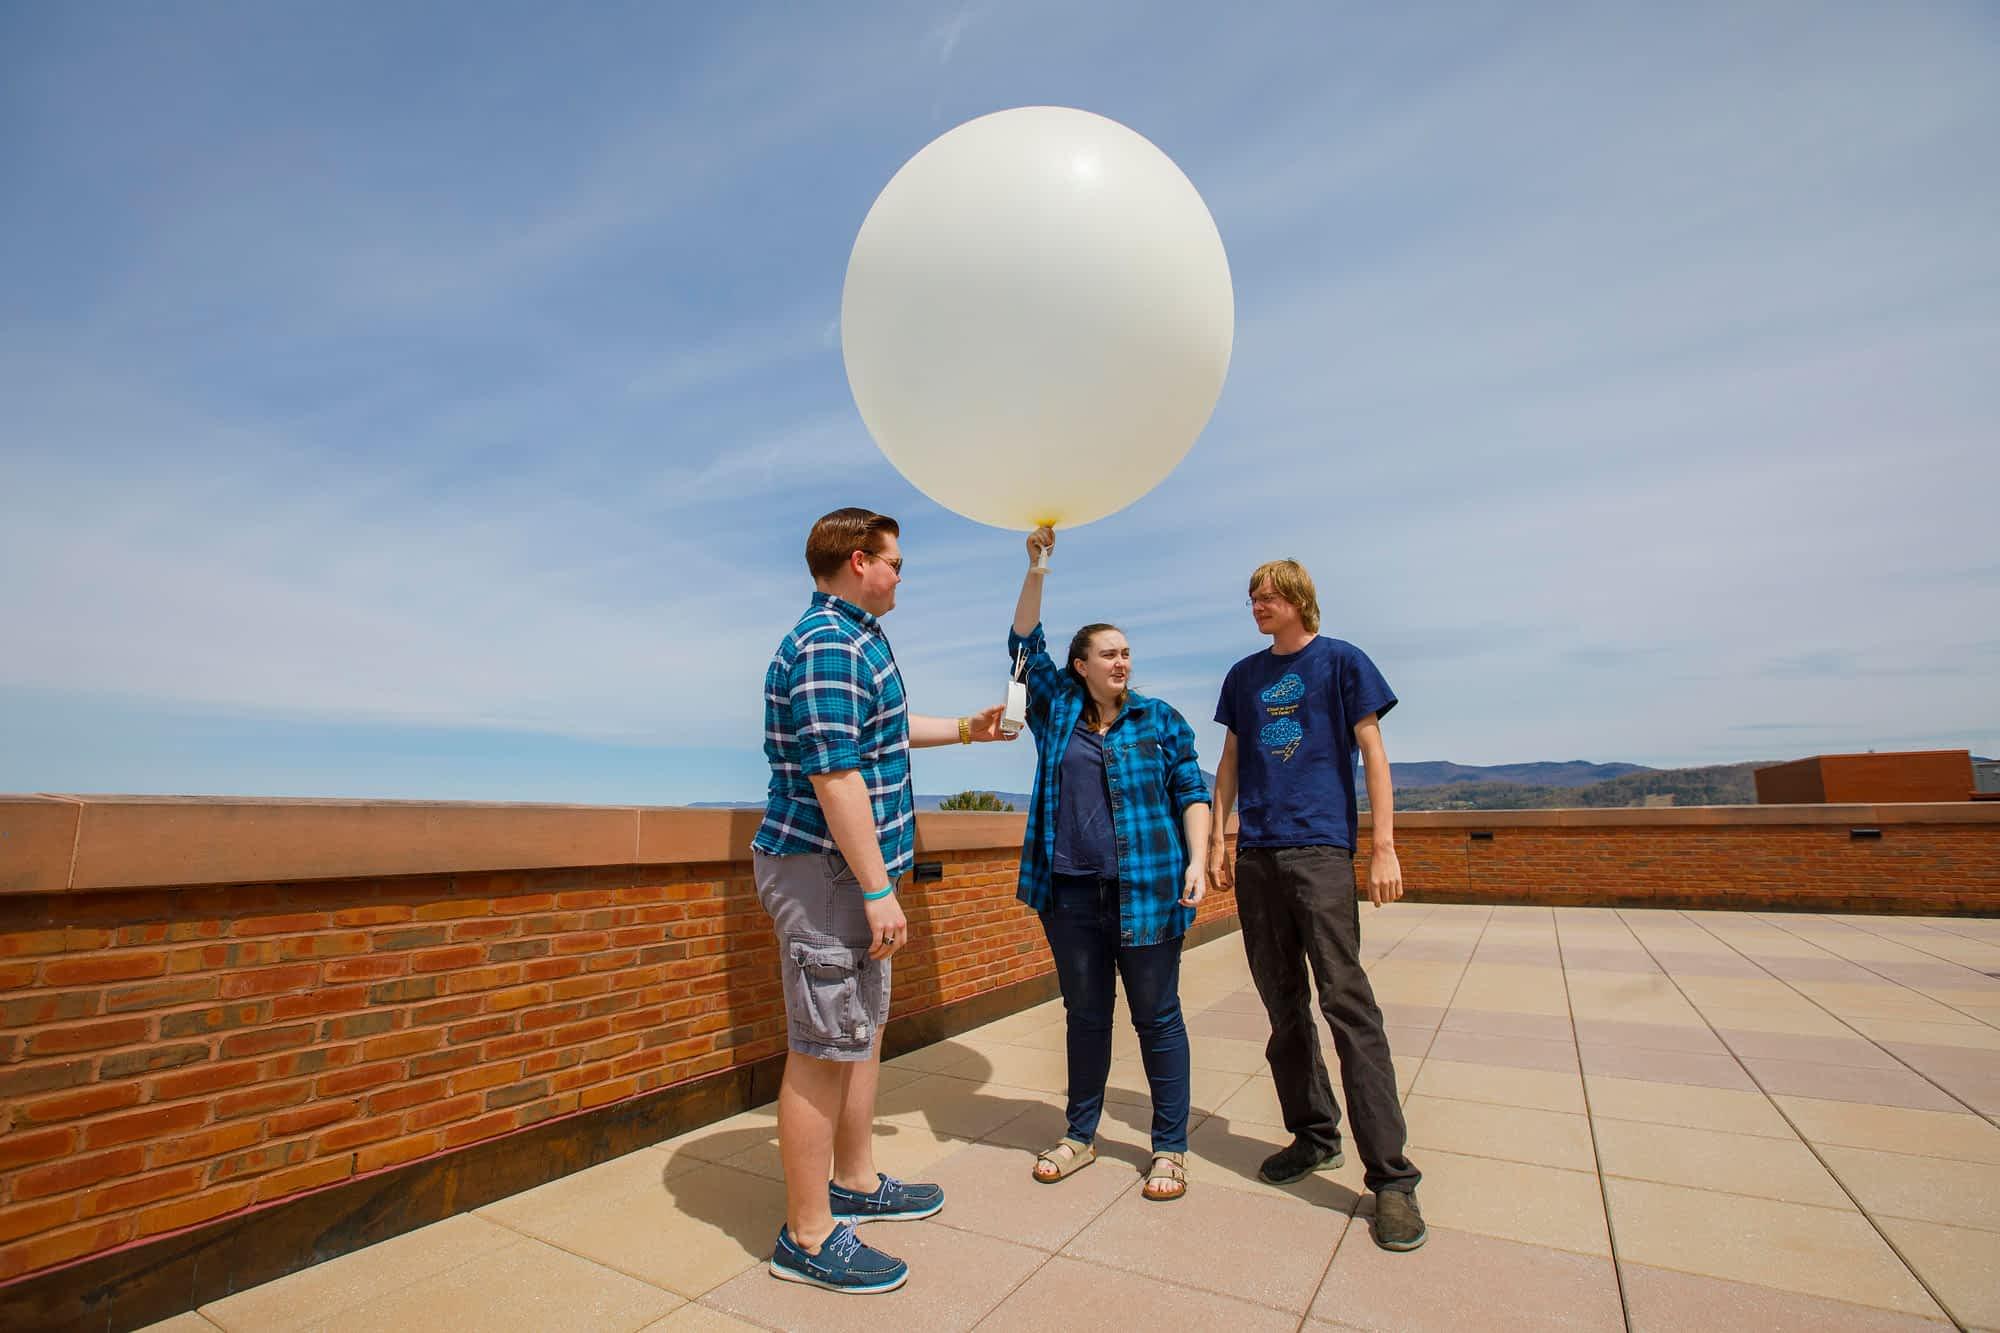 Launching weather balloons